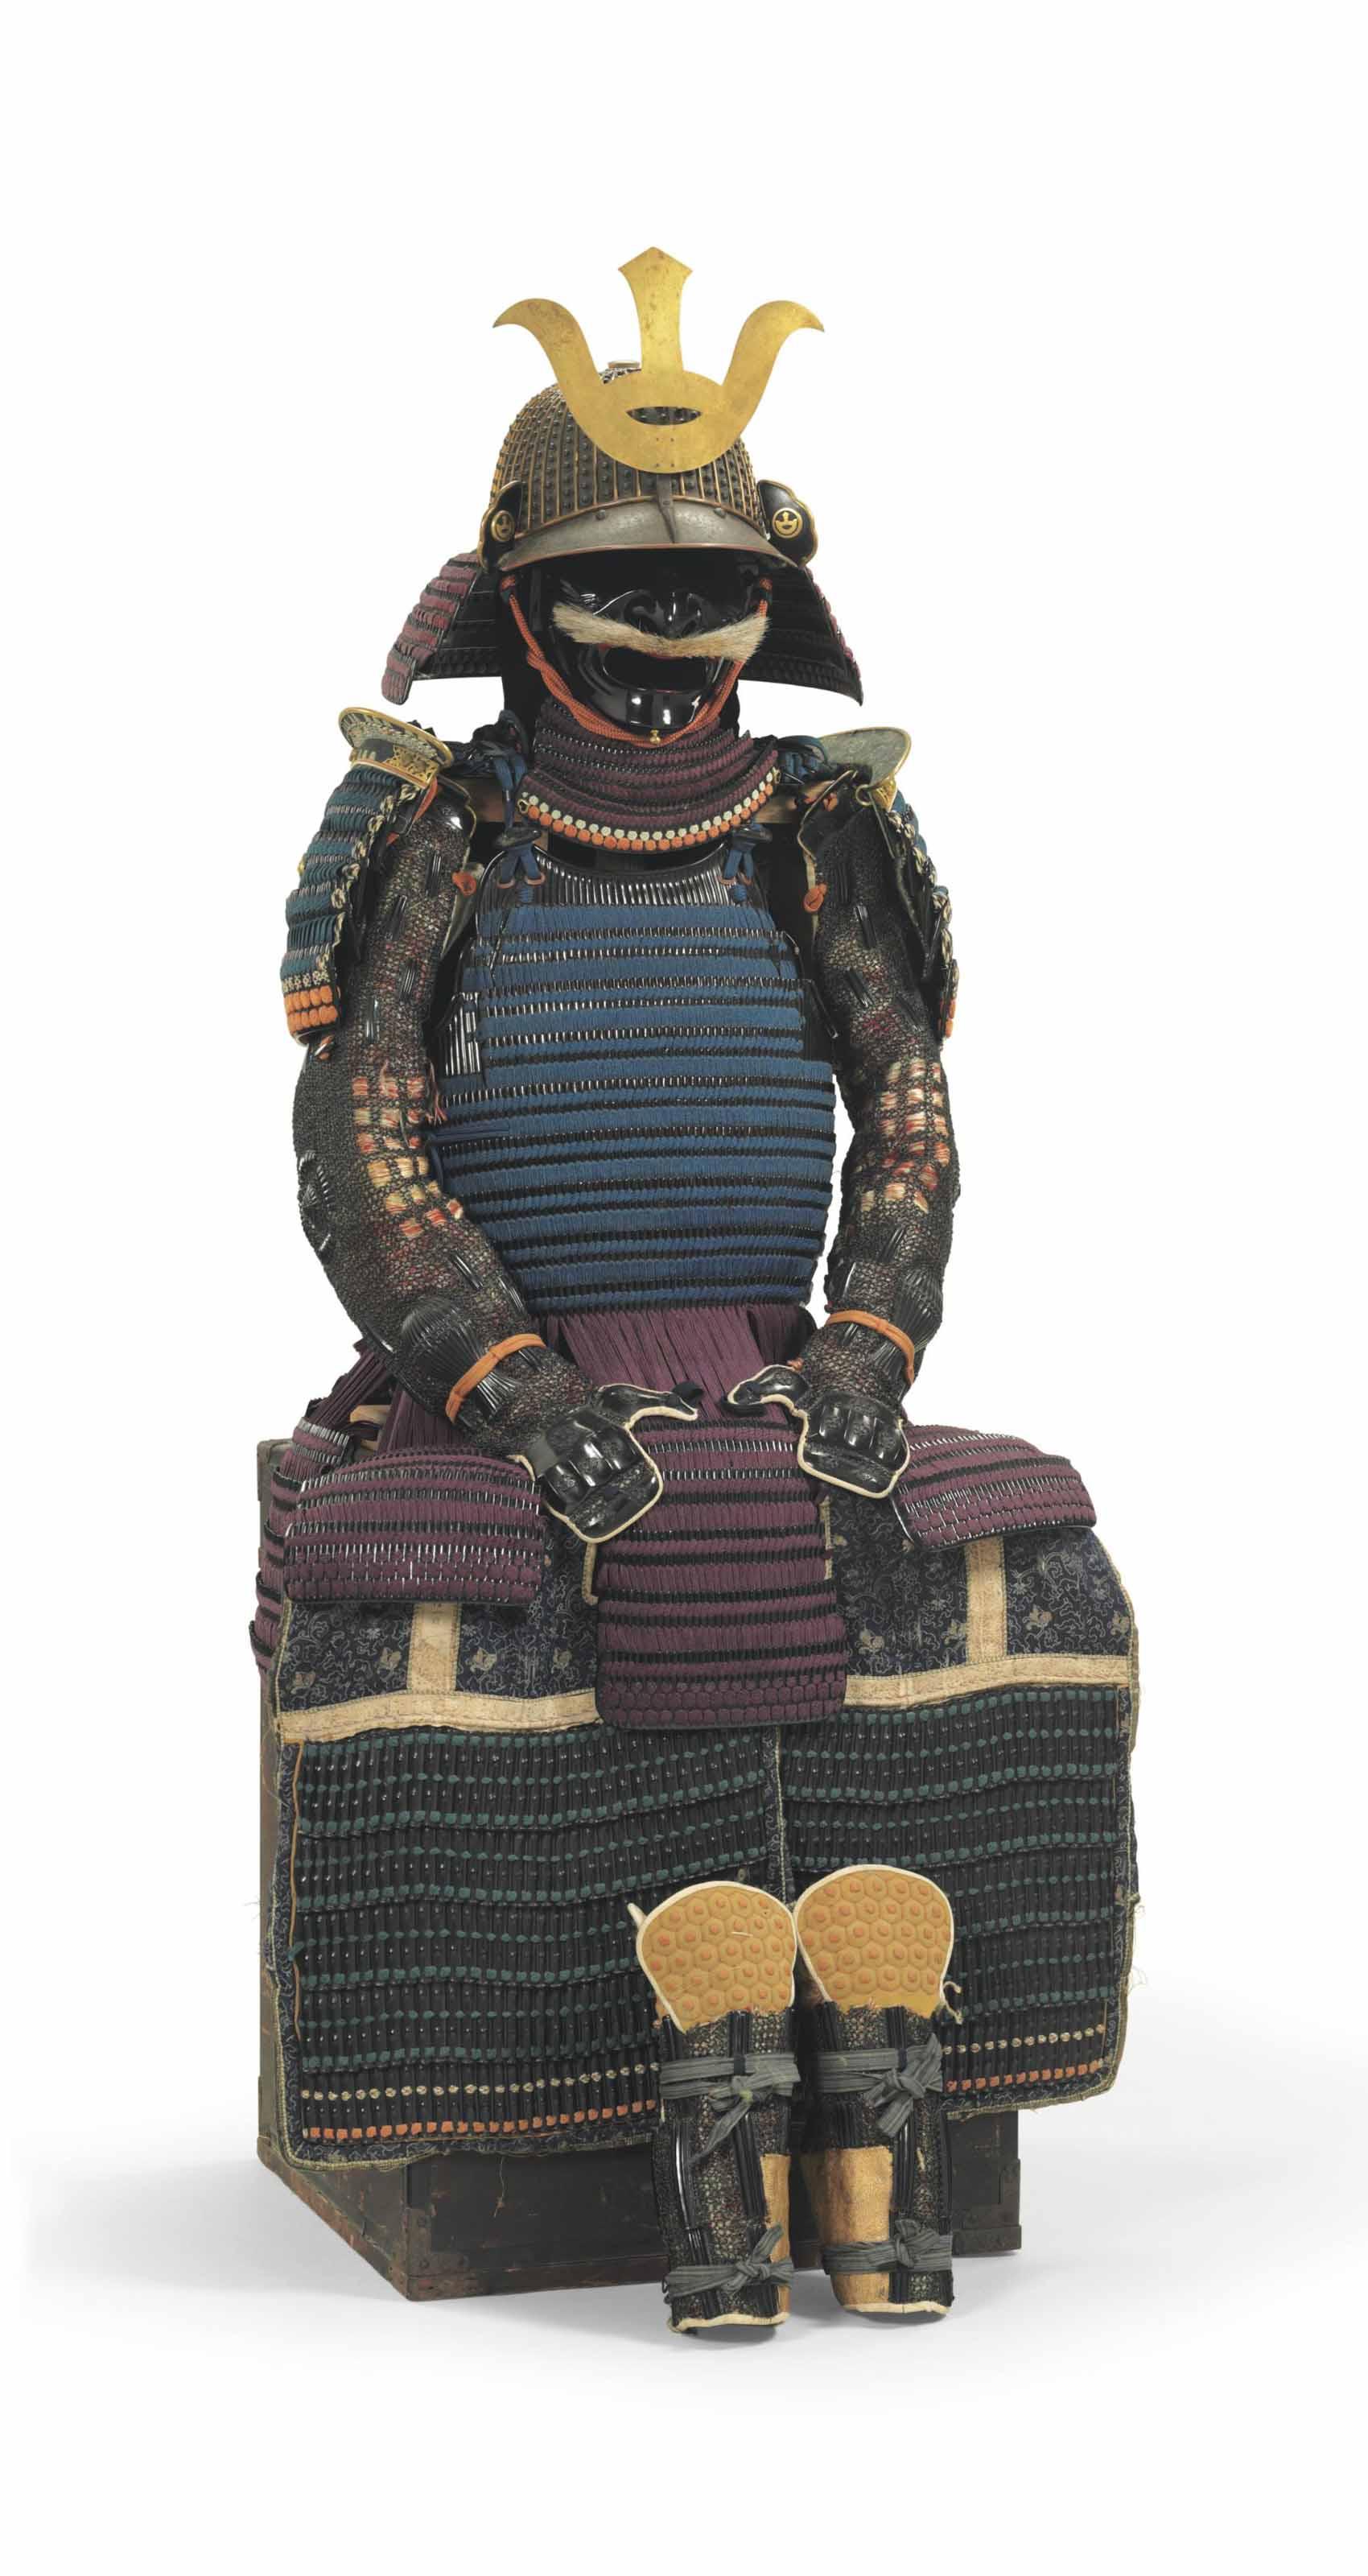 A Hanaito odoshi nimai-do gusoku (blue and purple laced two-piece cuirass armor)